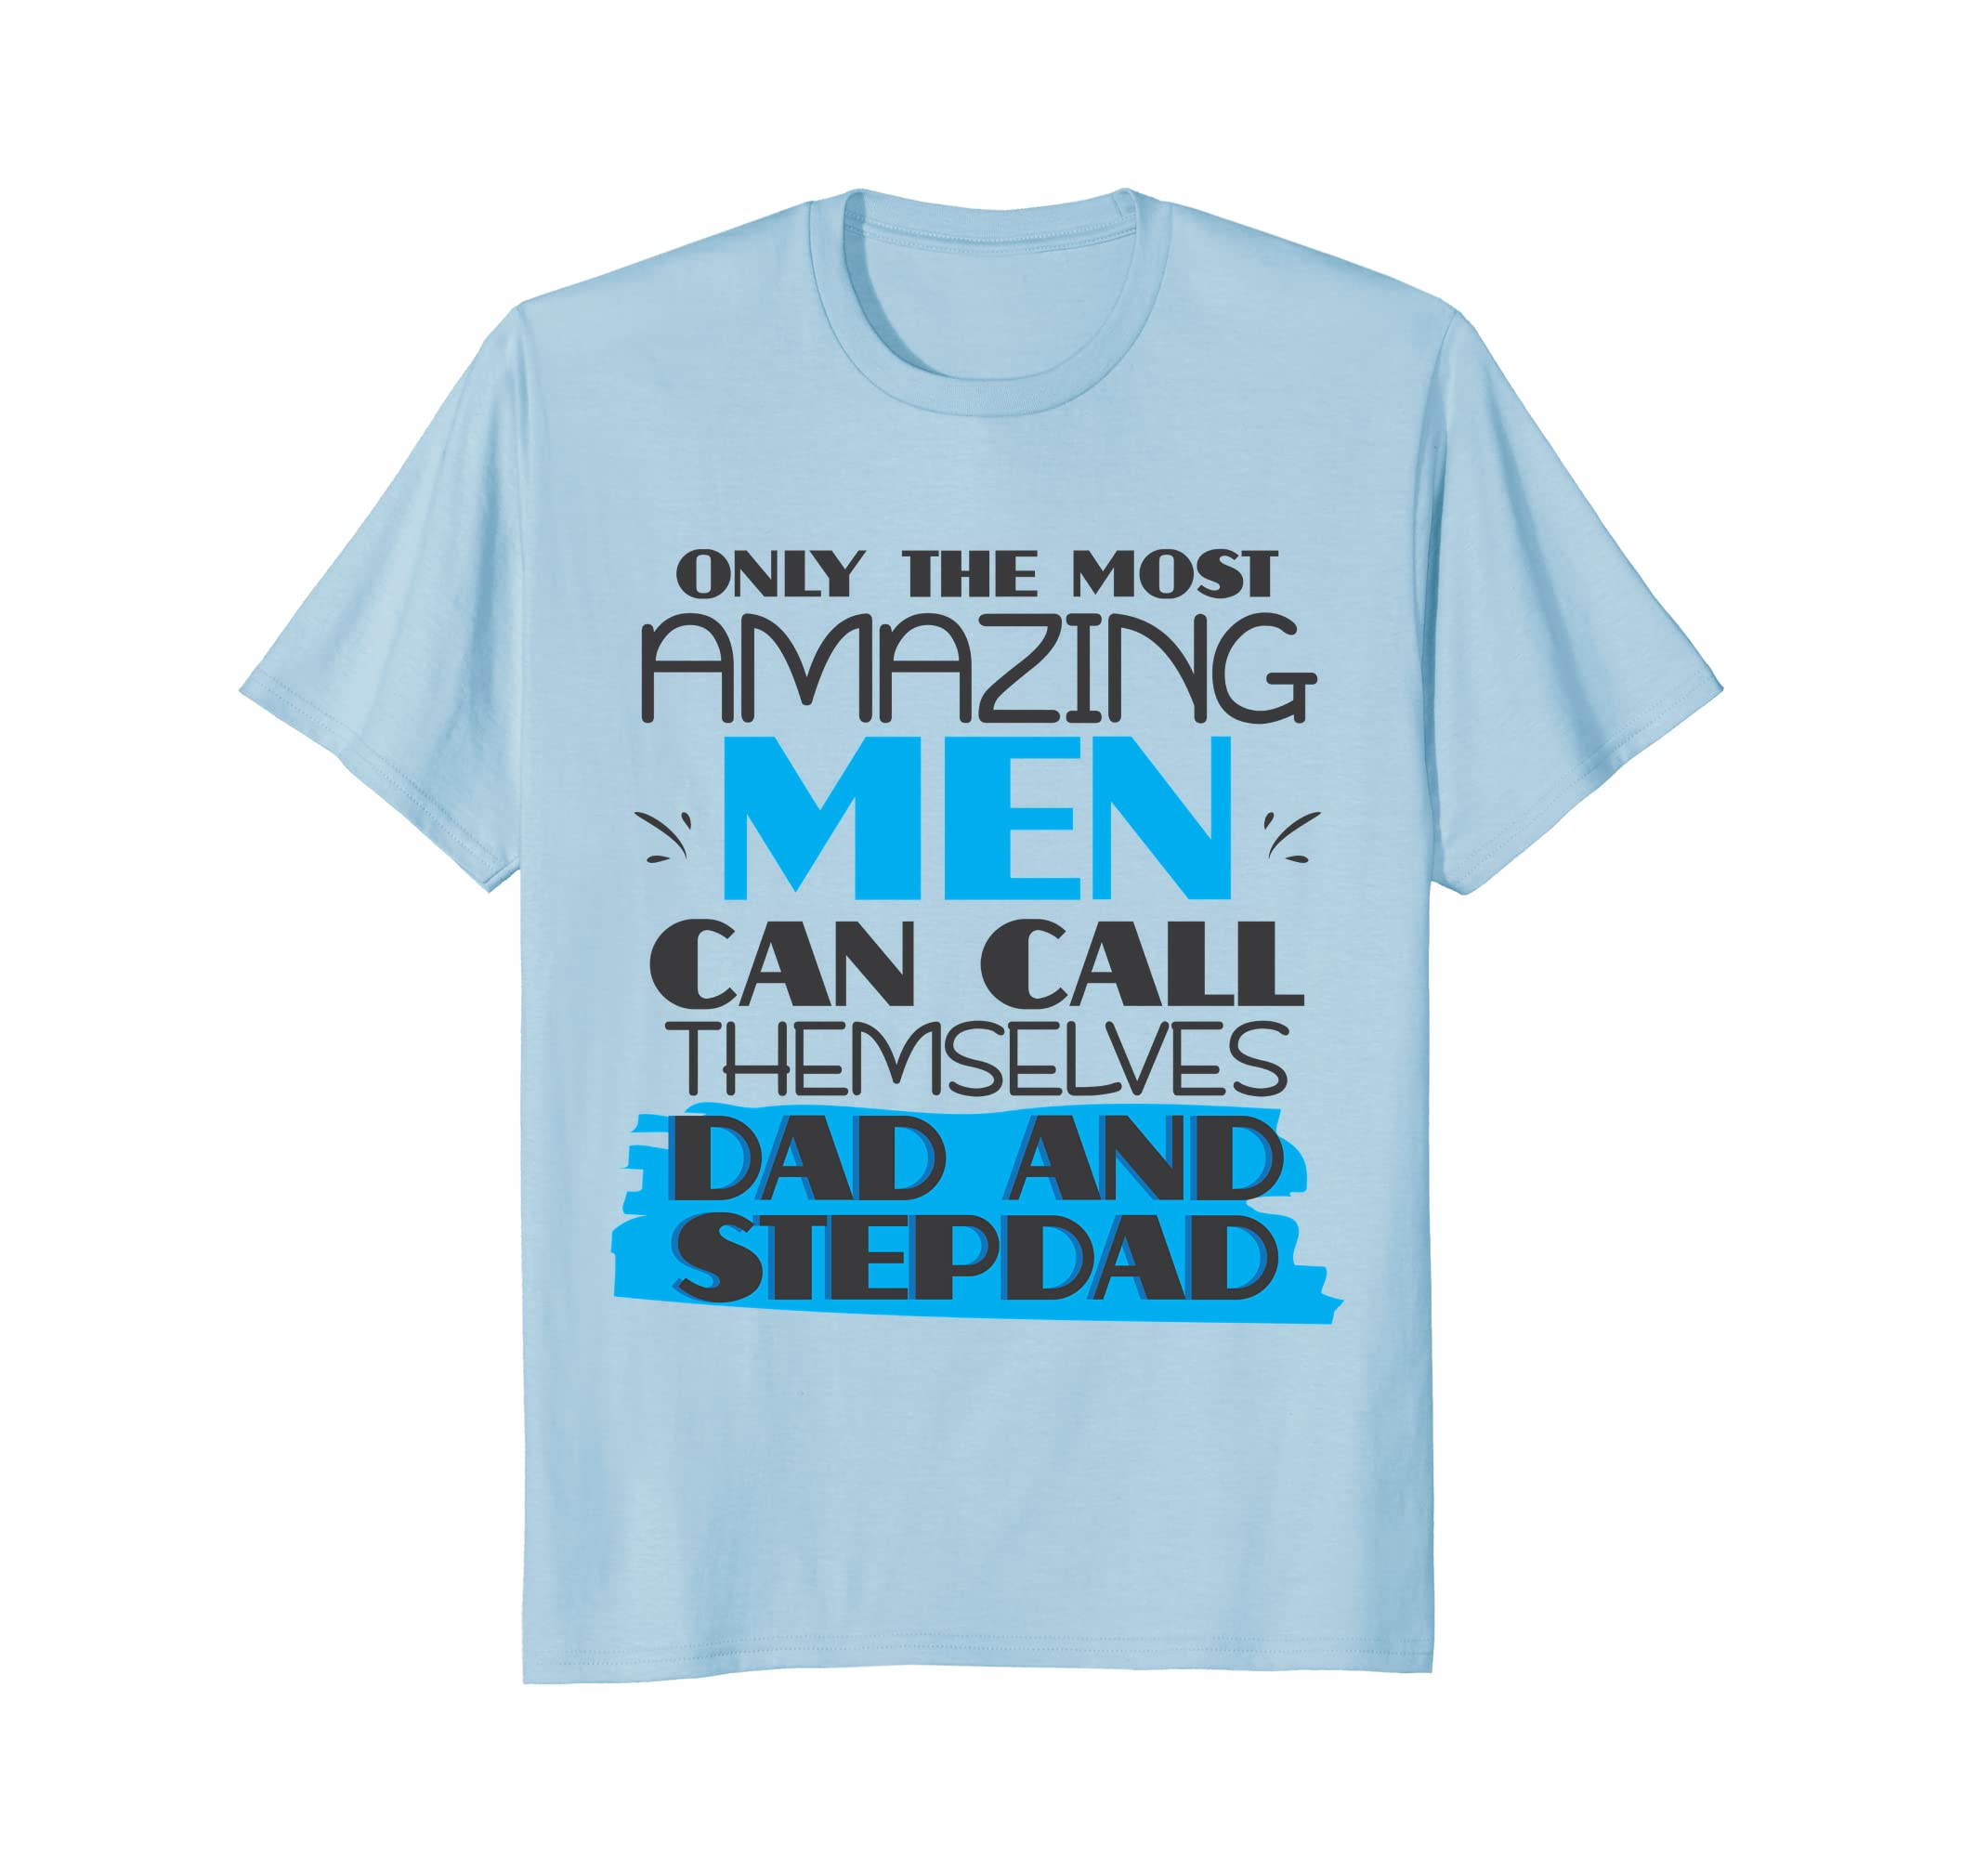 af5eb8b6af0 Only Most Amazing Men Call Dad Stepdad T-shirt Funny Gift-anz